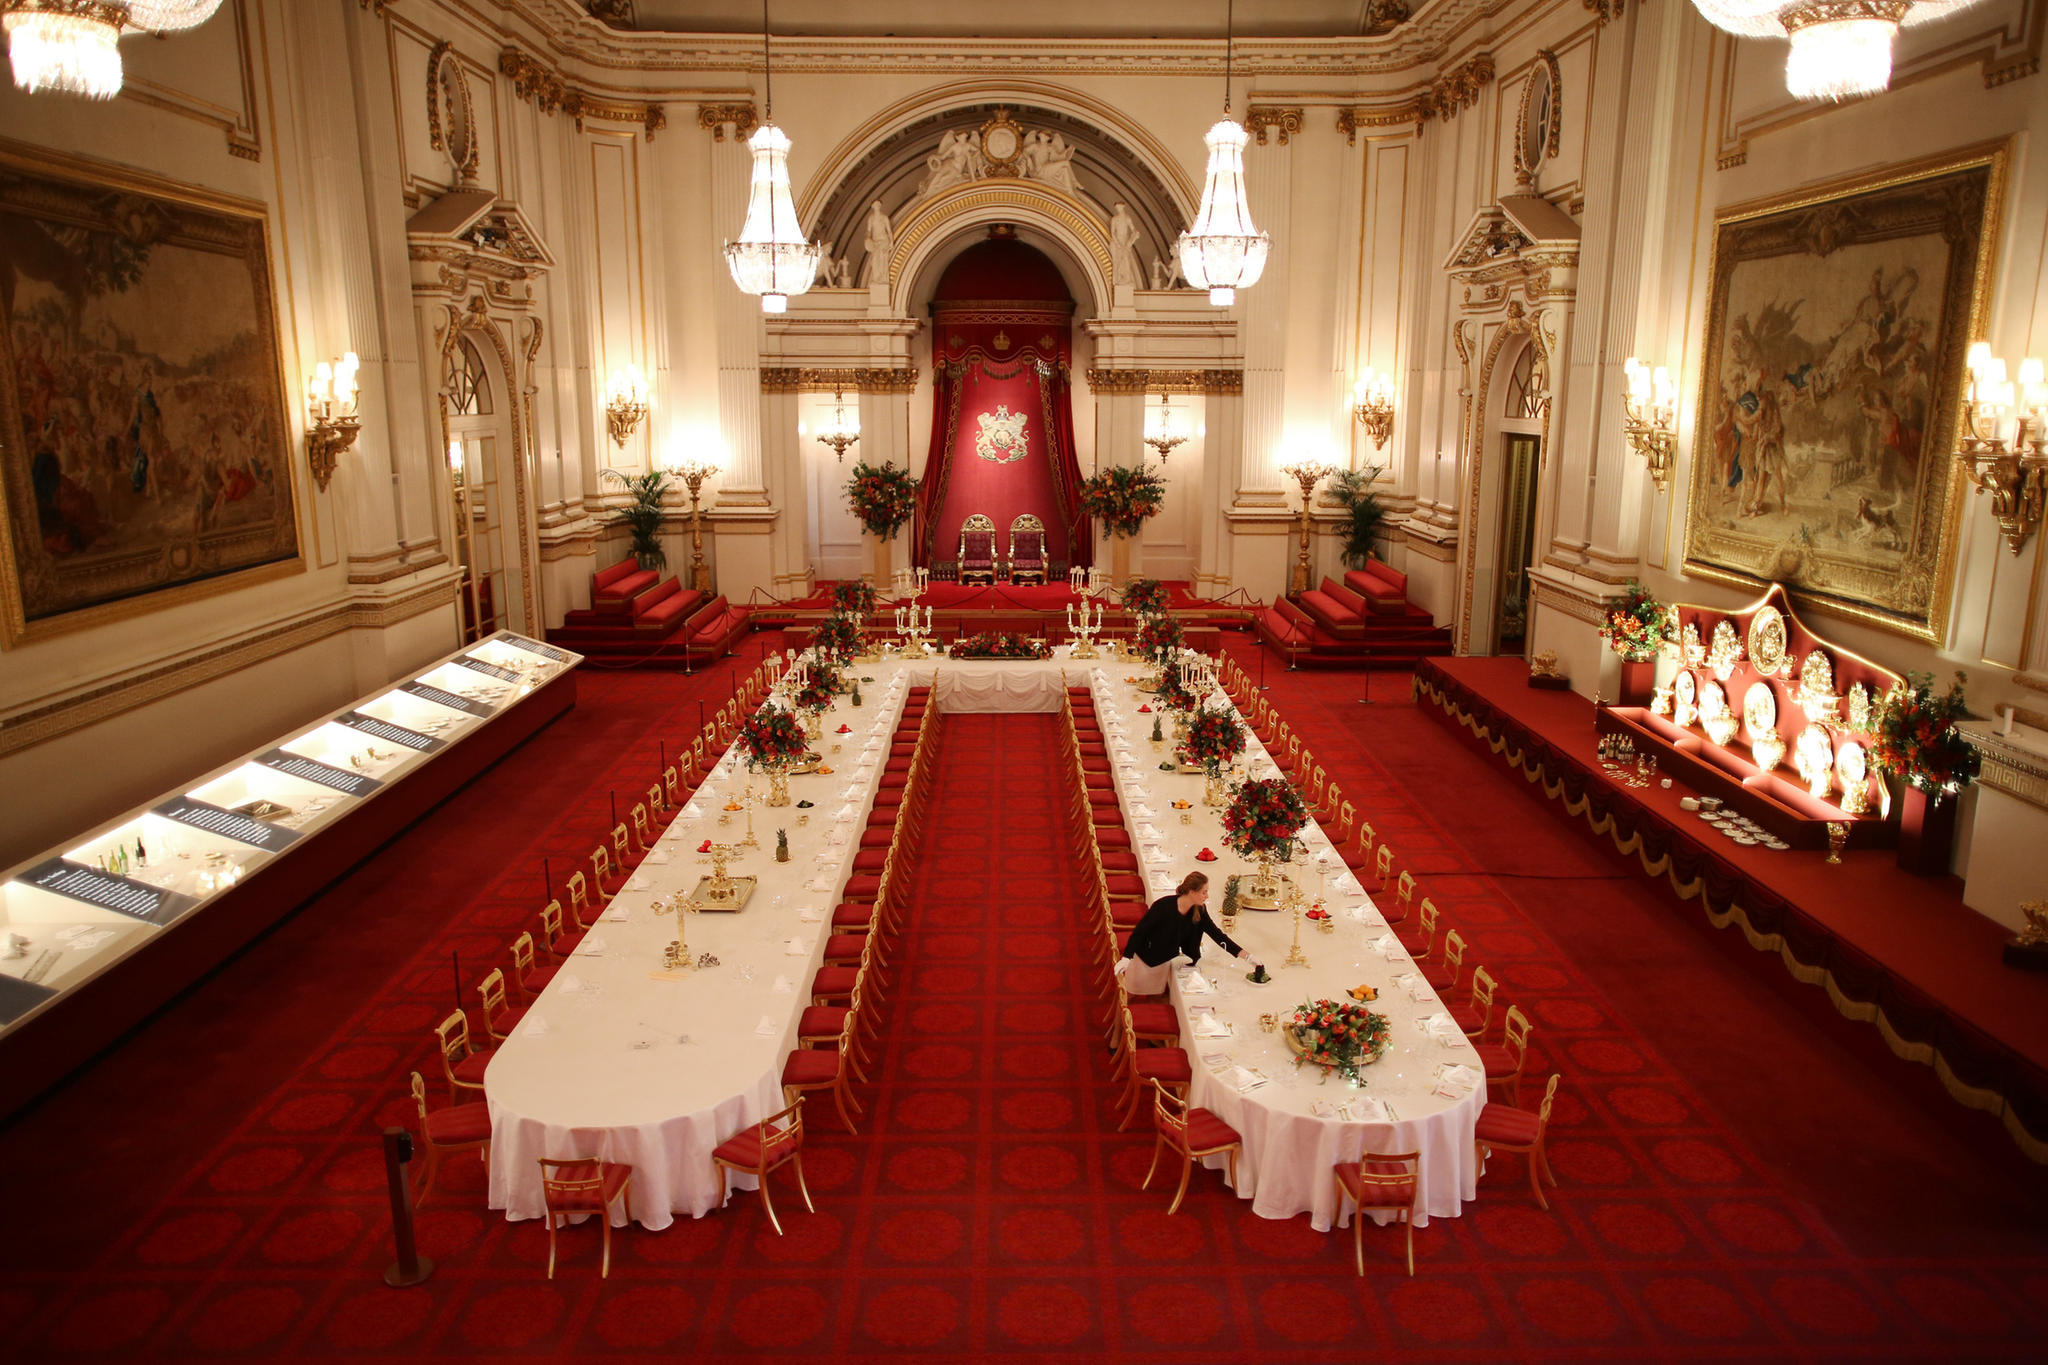 Der Ball Room im Buckingham Palast